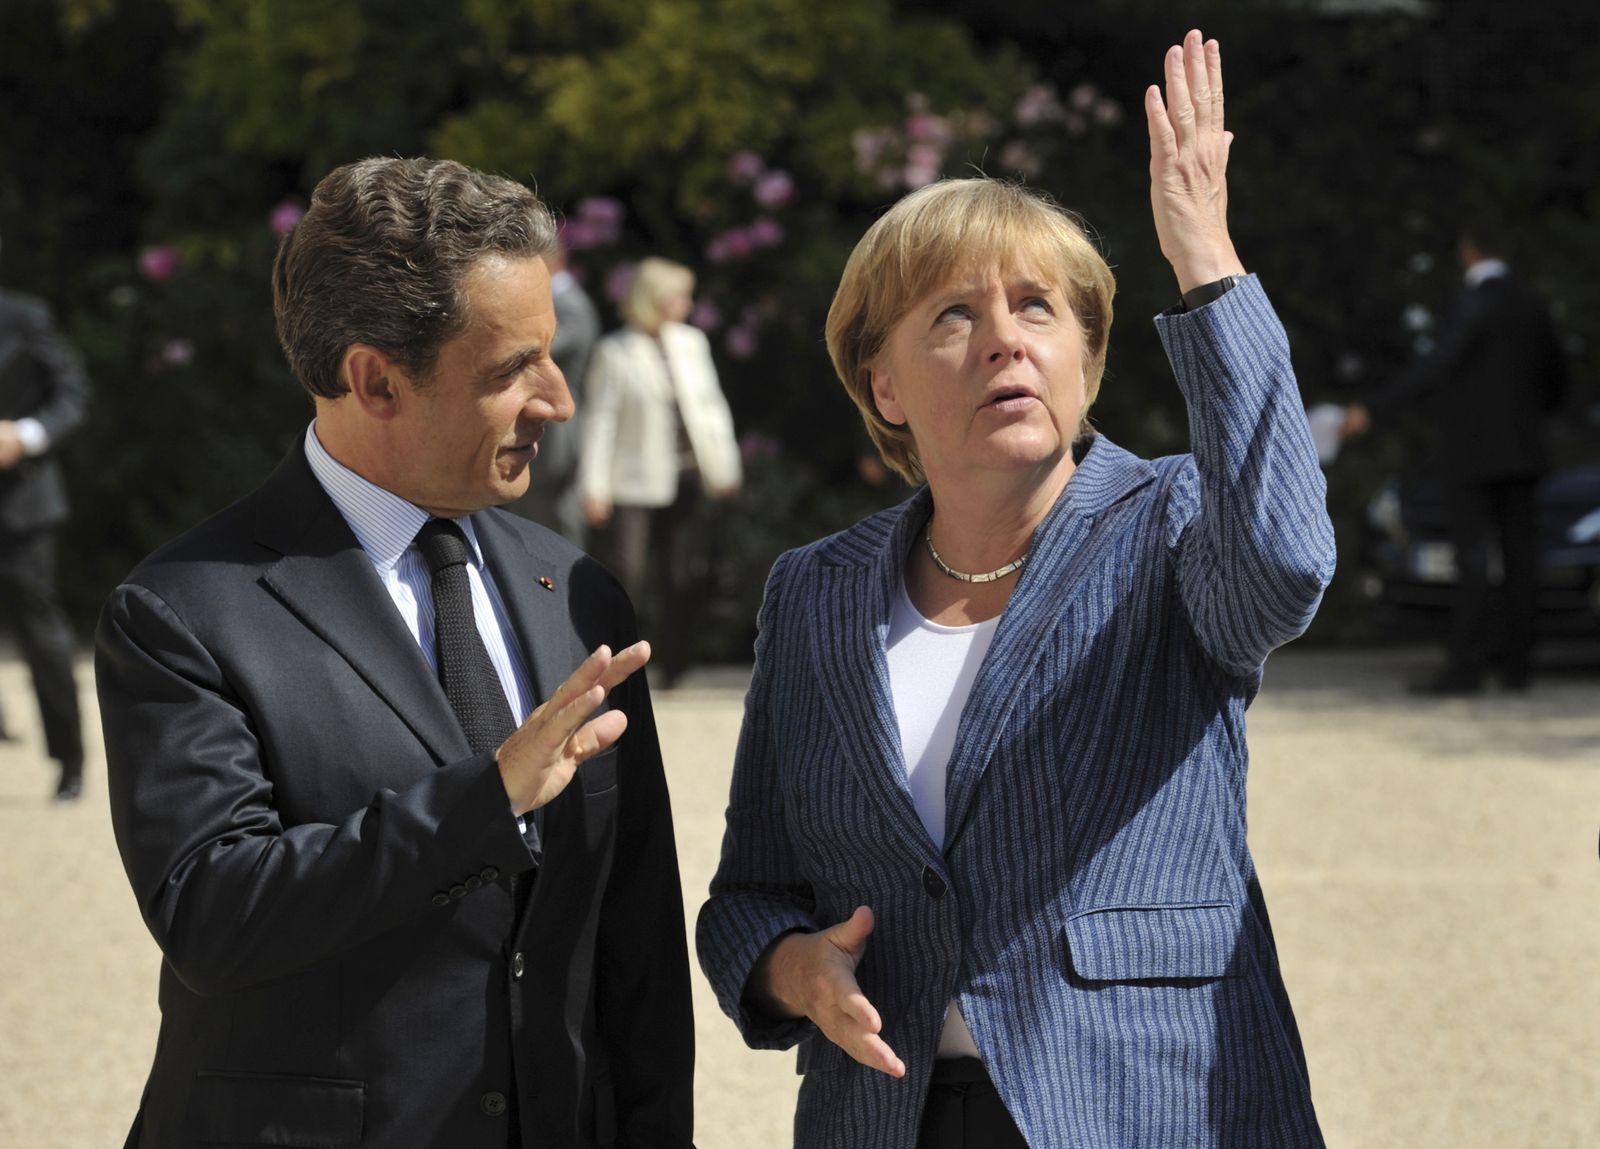 Nicolas Sarkozy / Angela Merkel